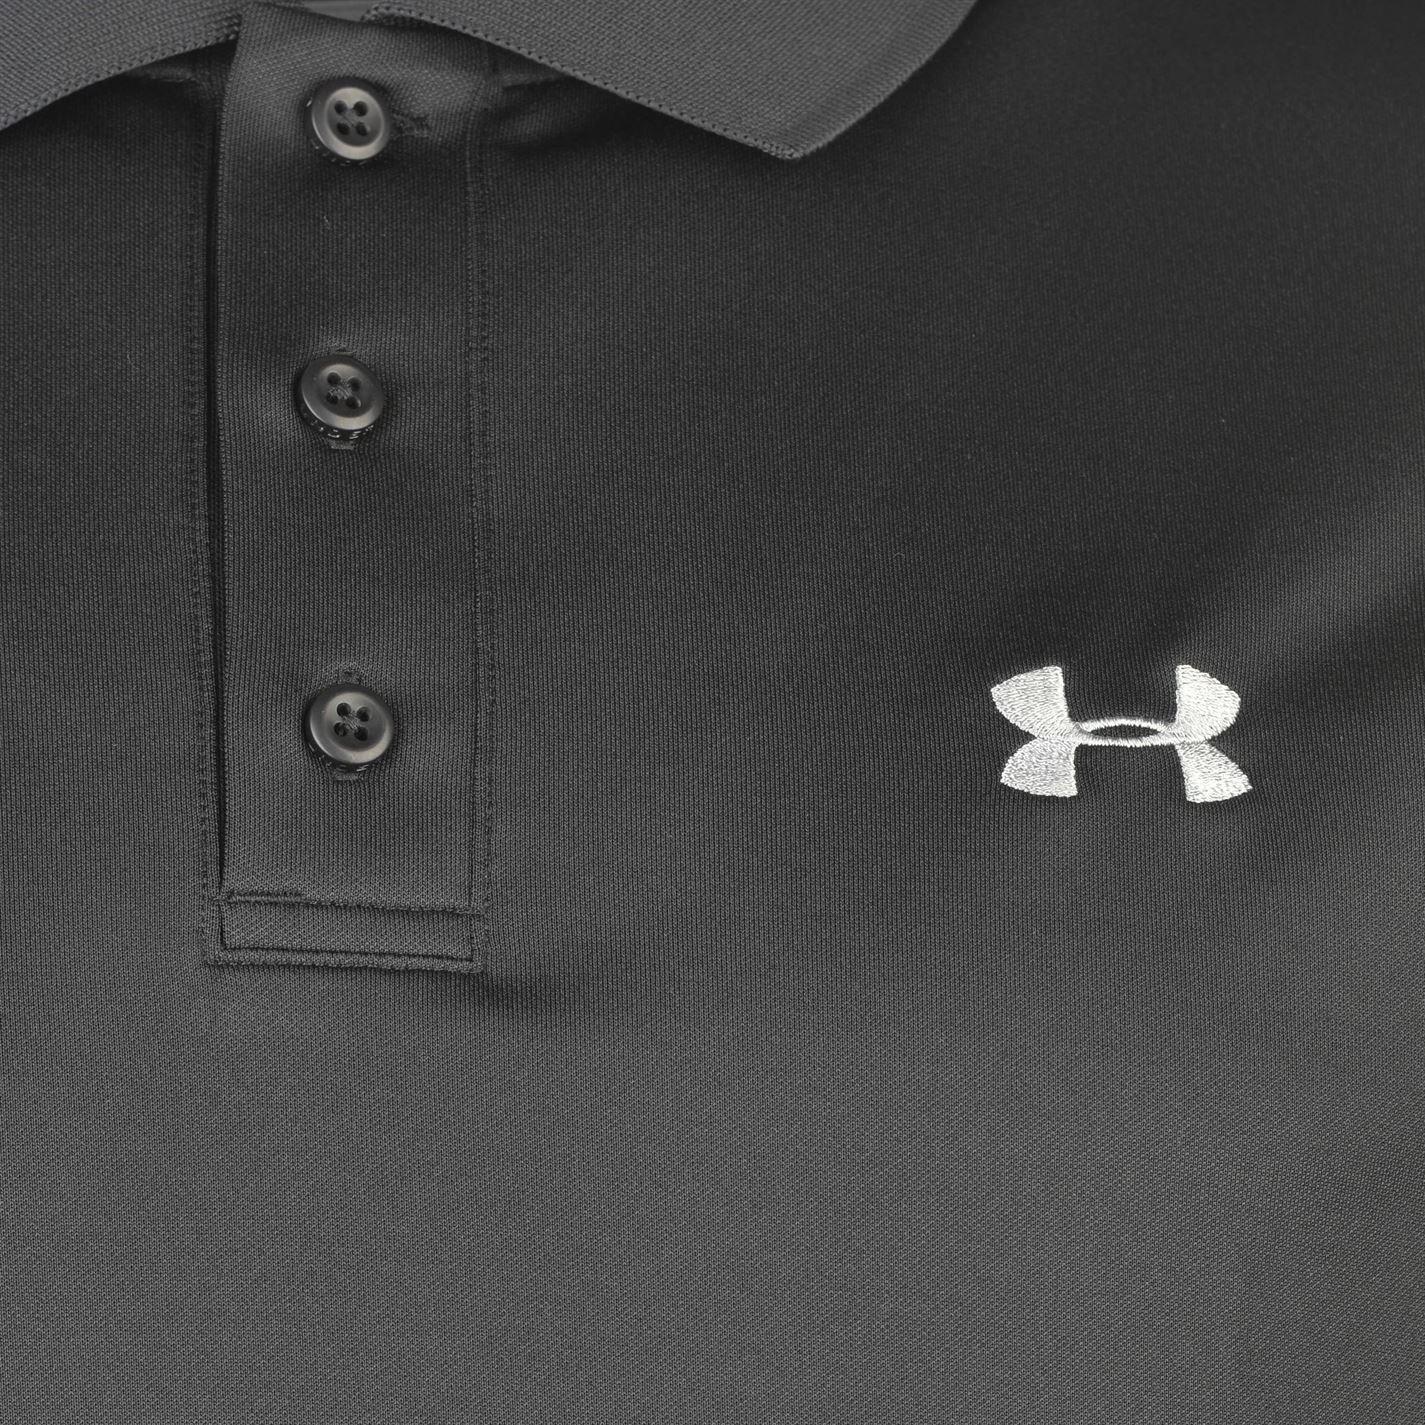 Under-Armour-Camiseta-Polo-para-hombre-realizar-Manga-Corta-Camiseta-Top-Golf-Deportes miniatura 17